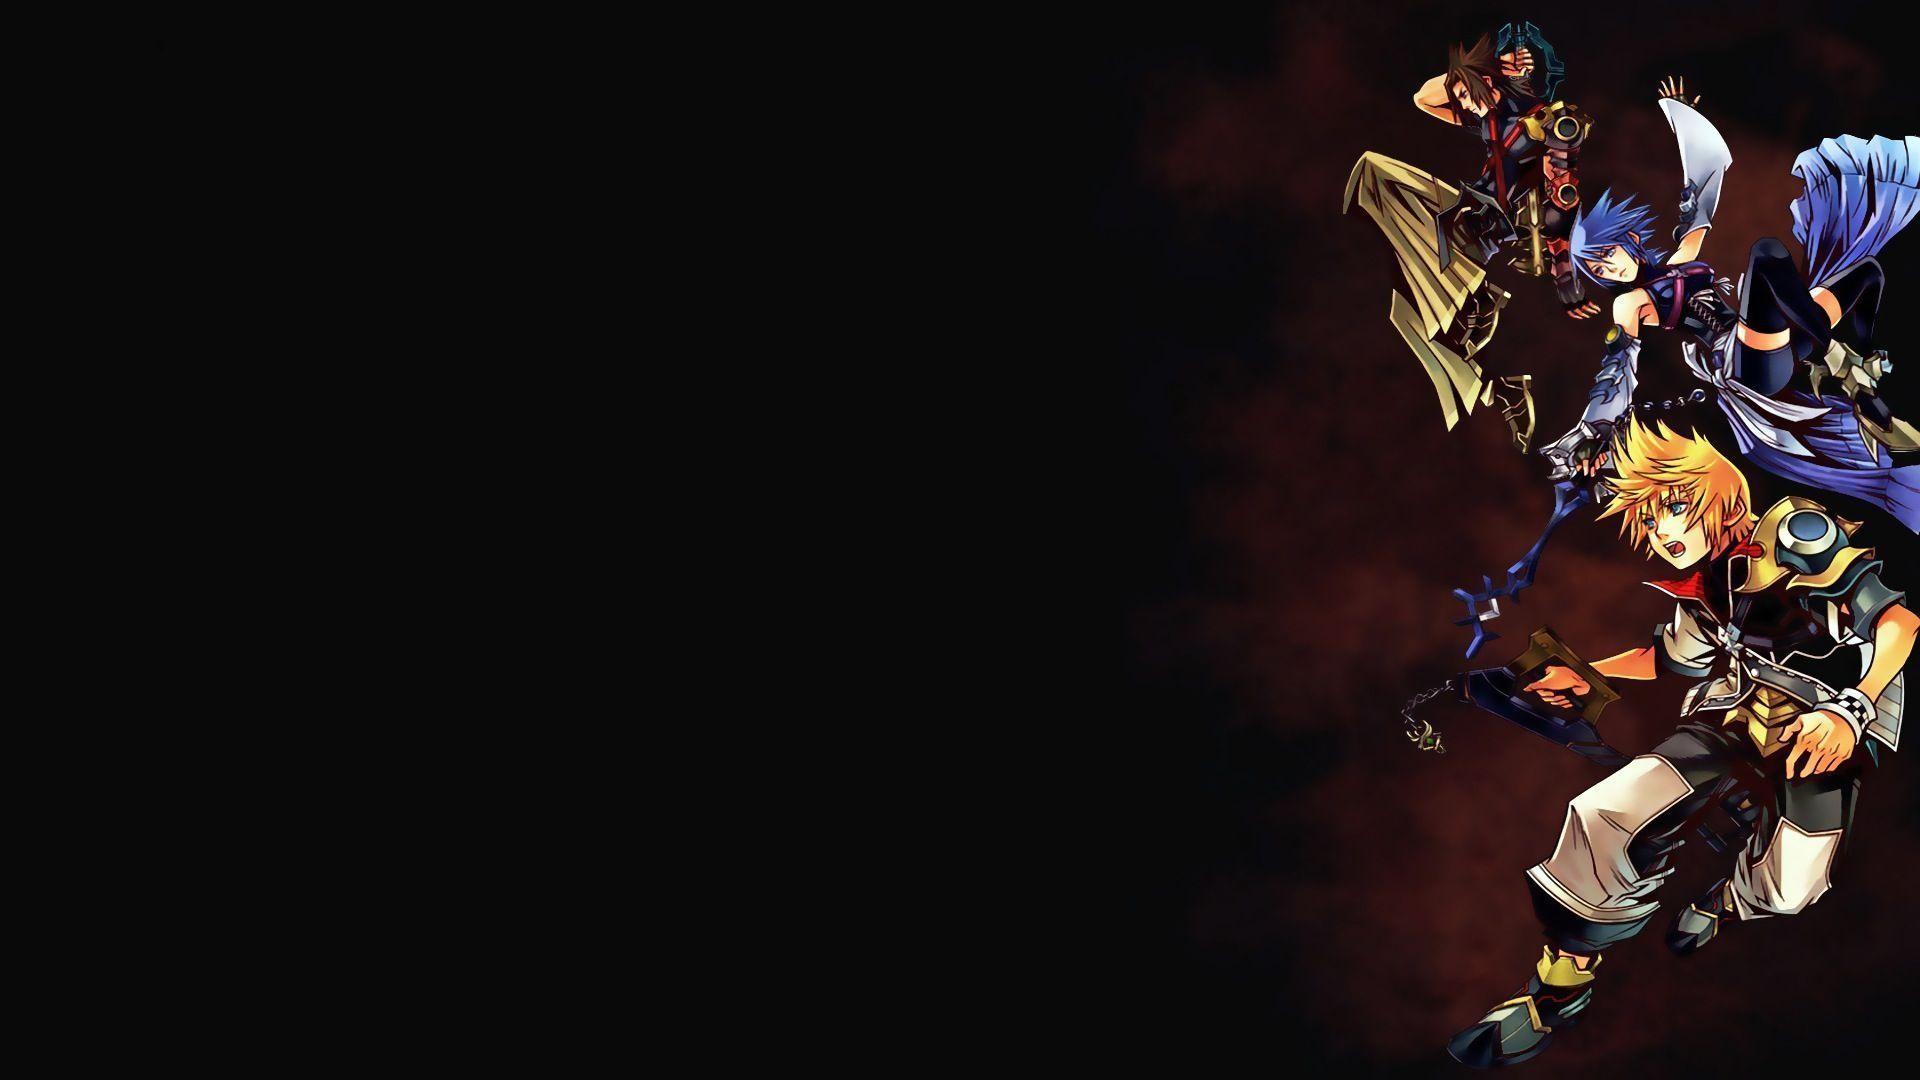 Wallpapers For > Kingdom Hearts Dream Drop Distance Wallpaper .